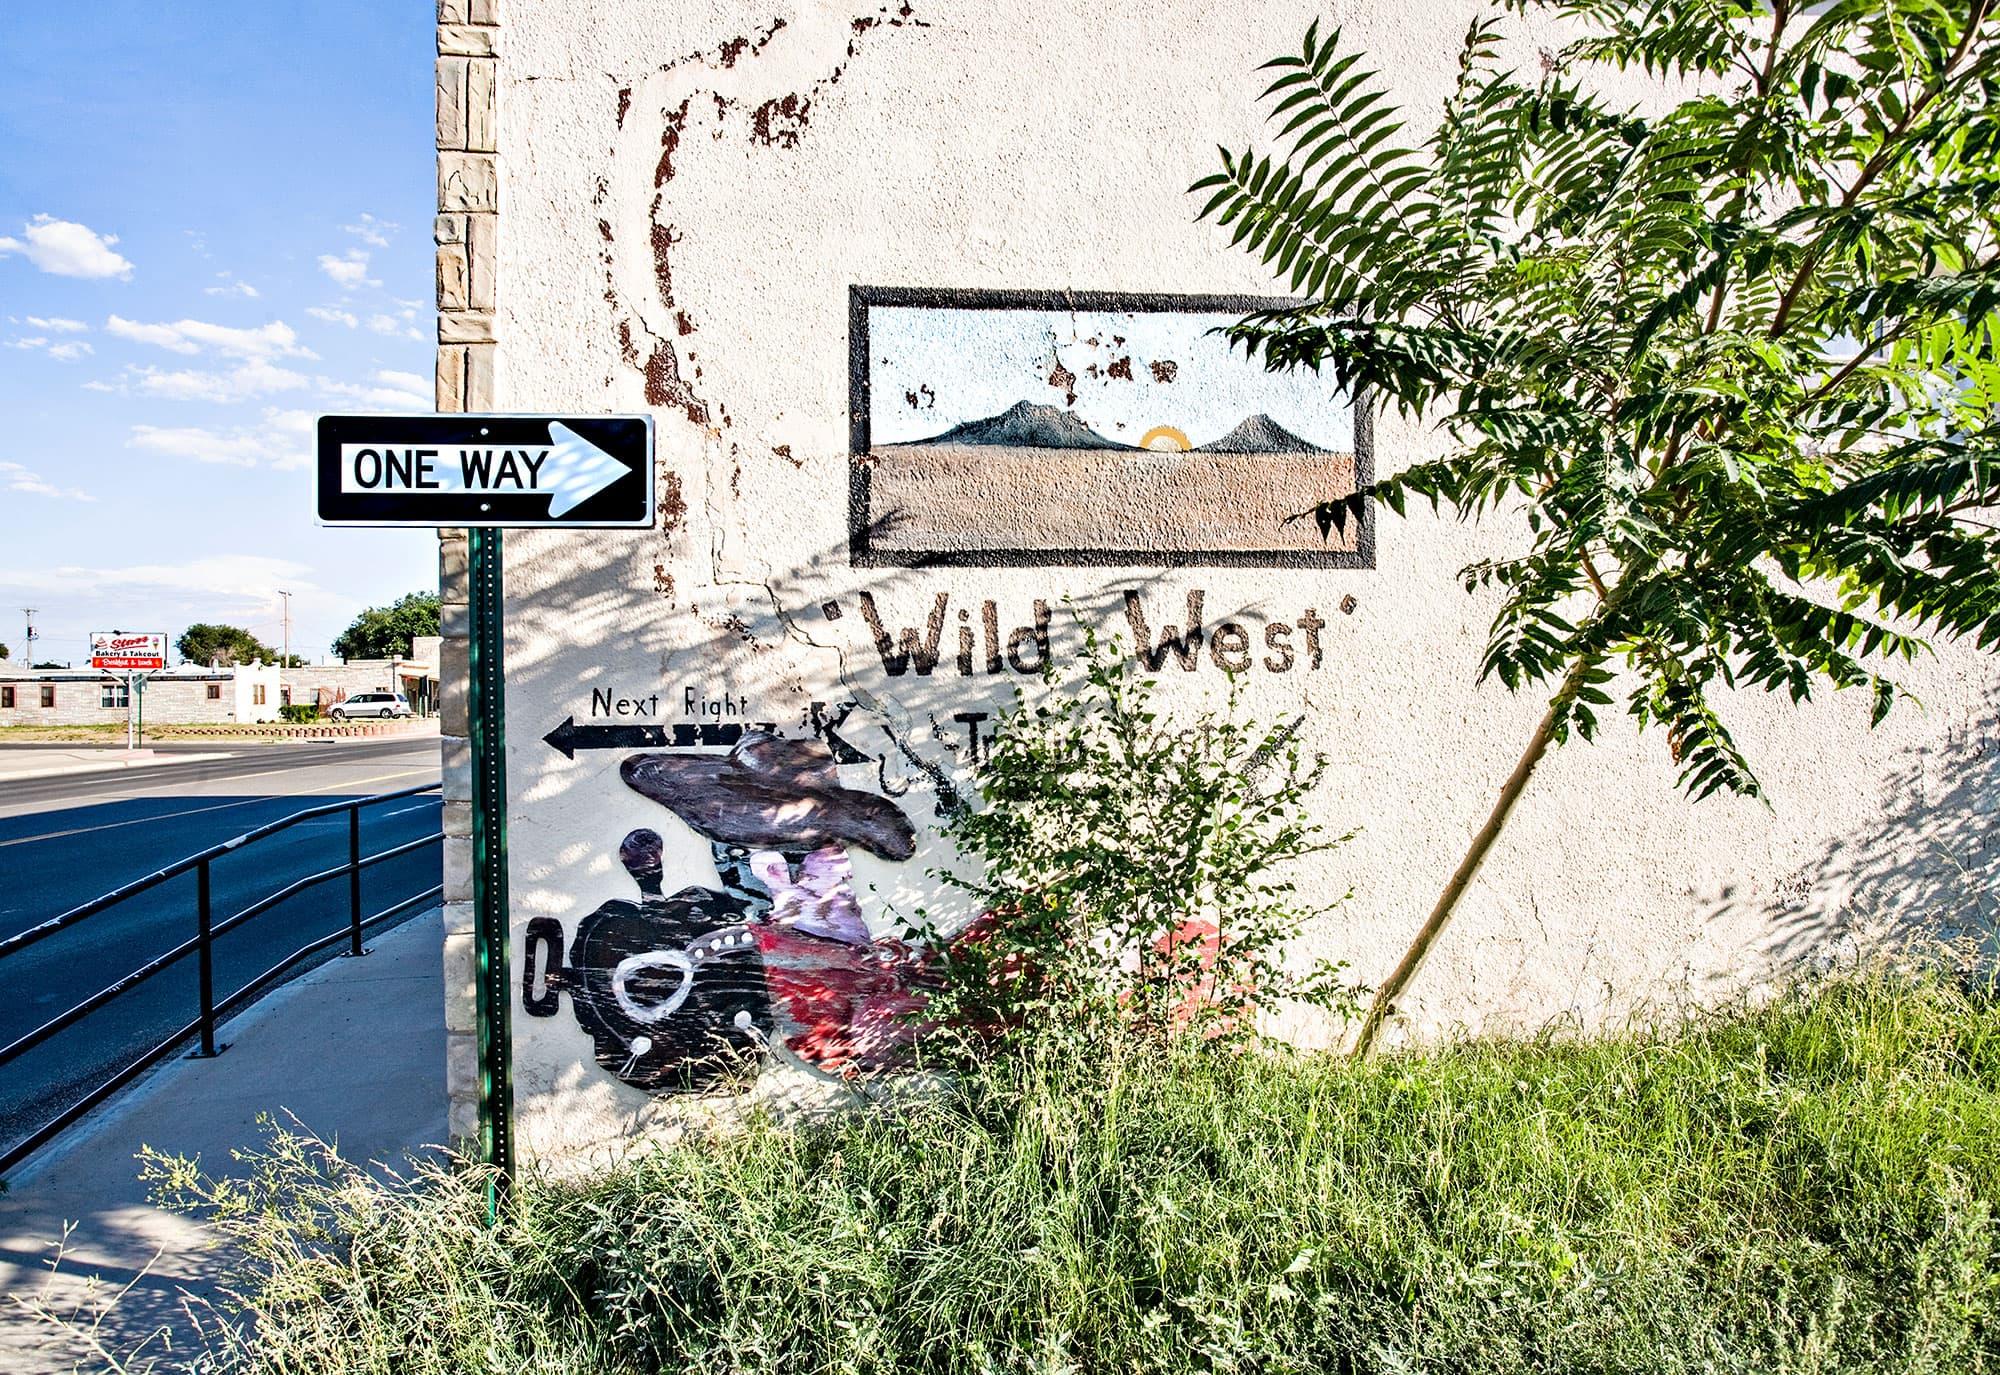 arthur-lazar-Wild-West-New-Mexico-2007